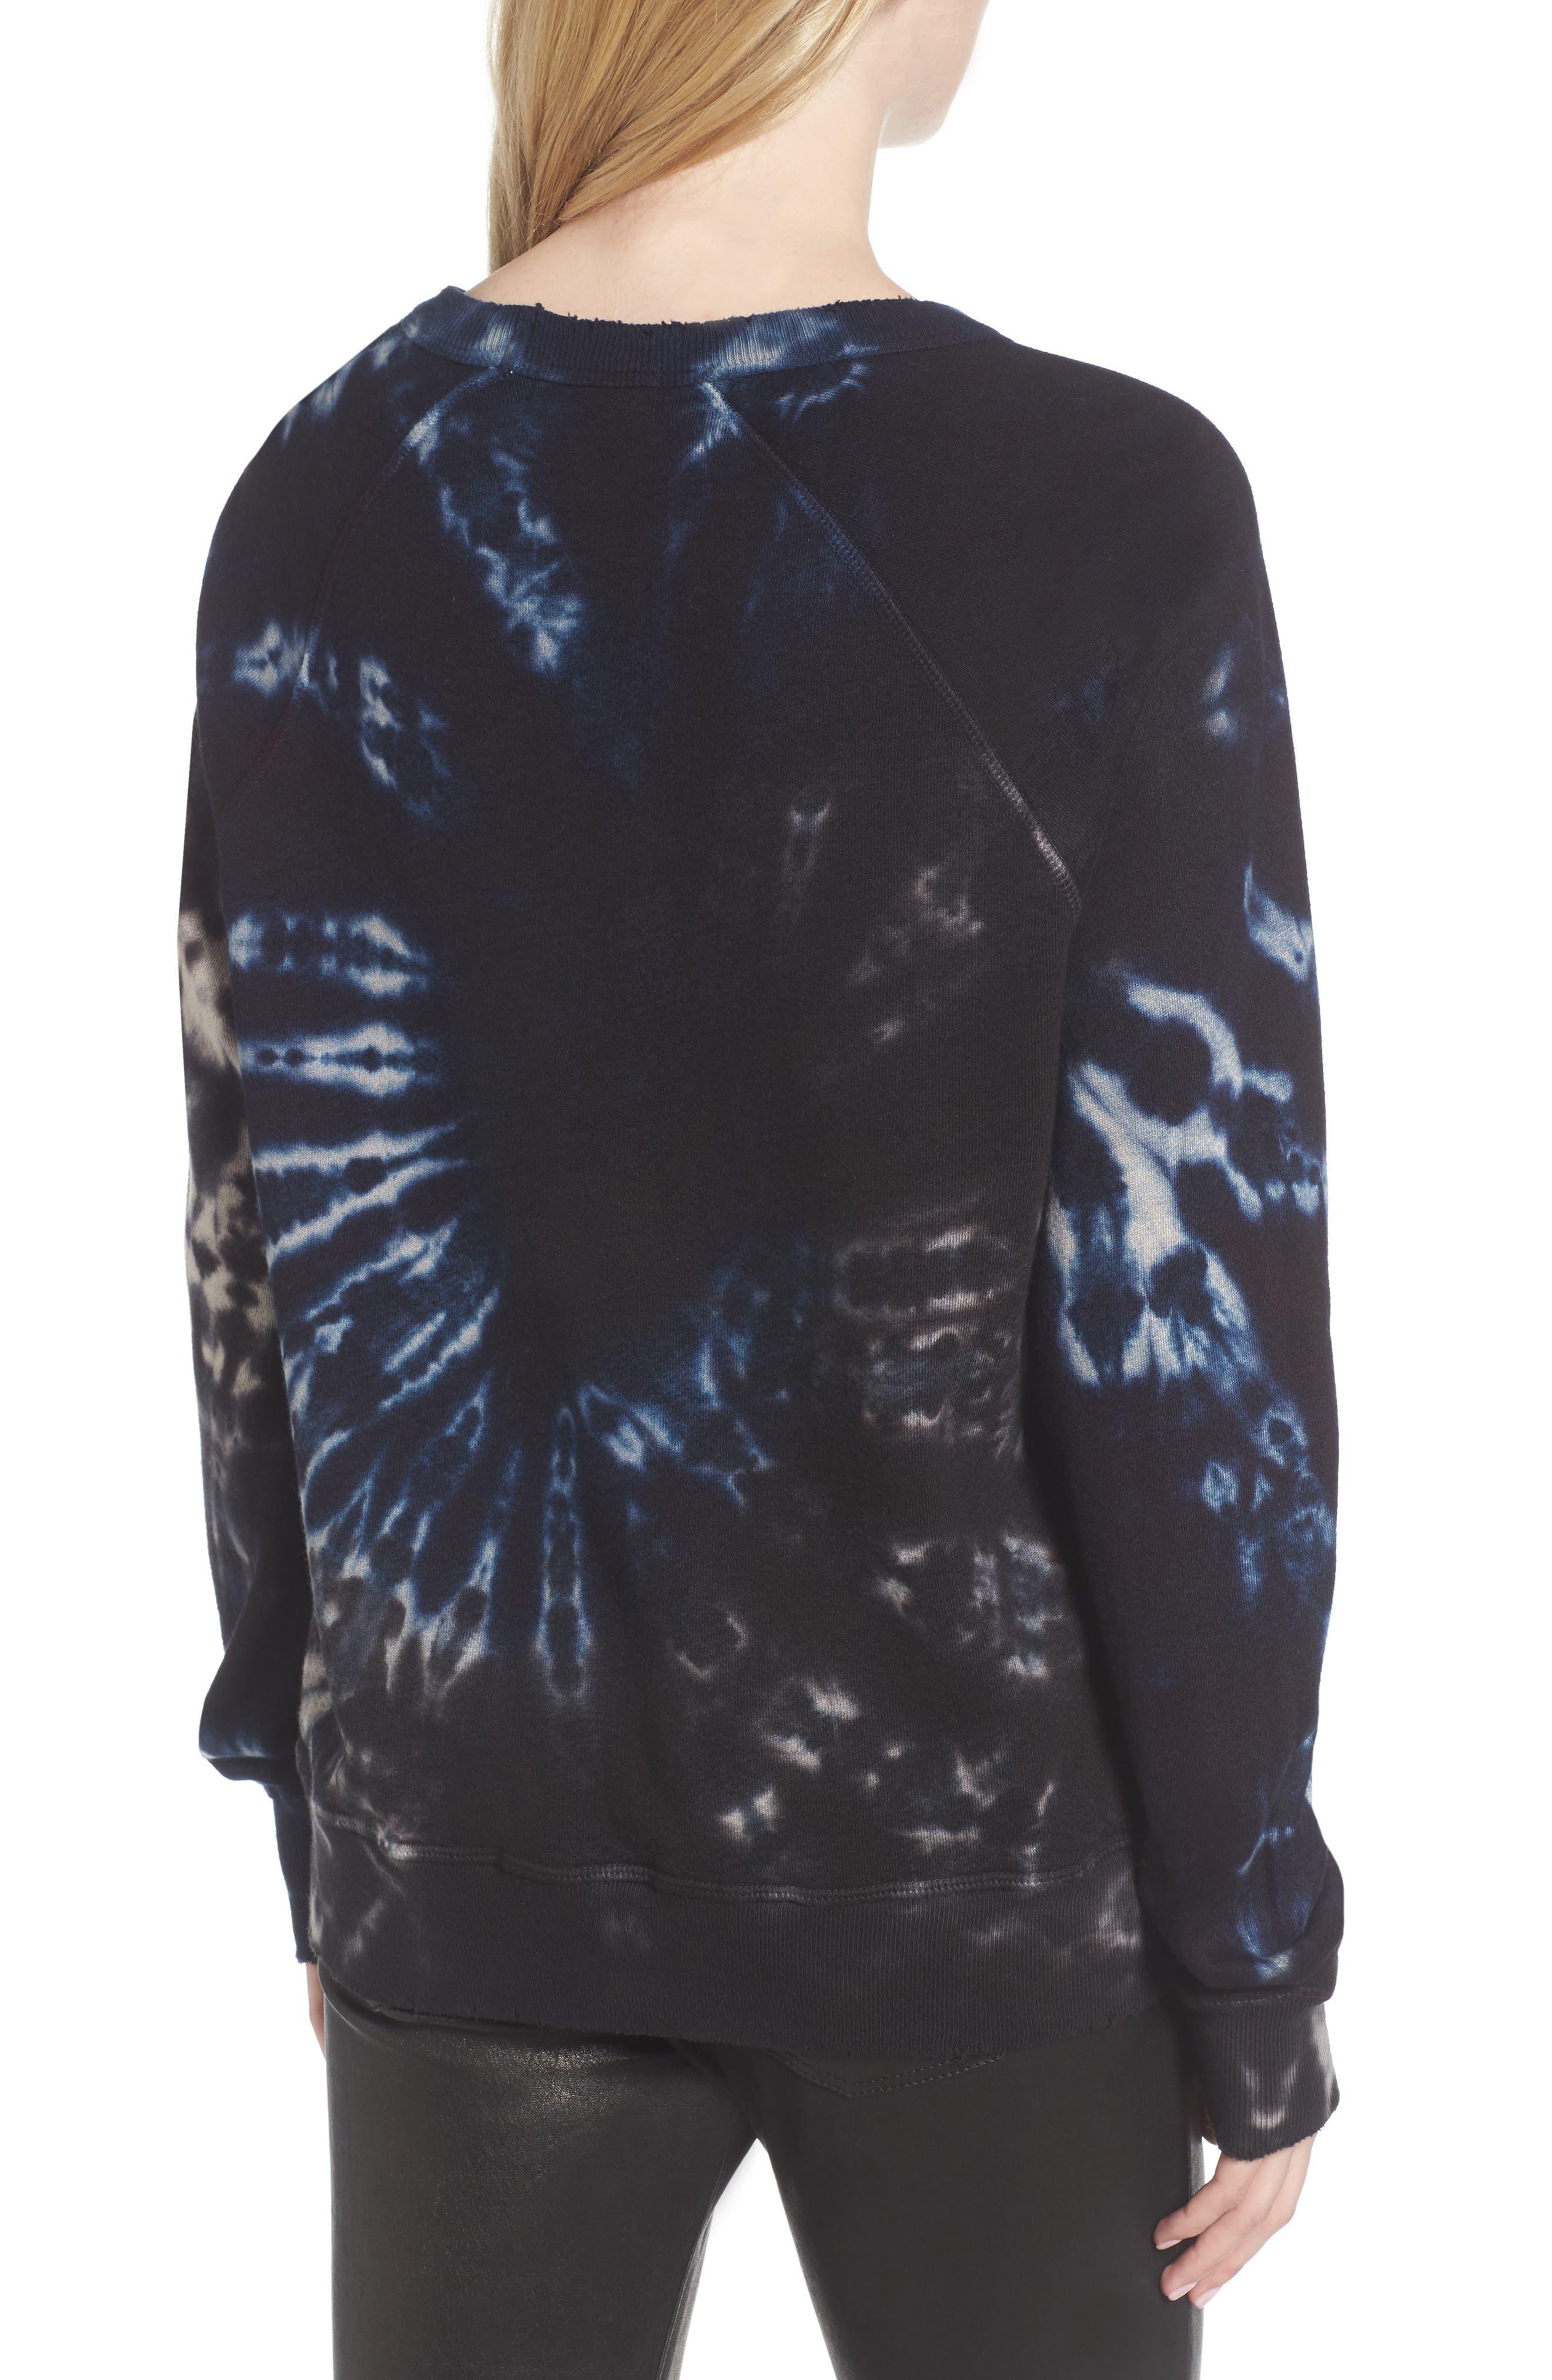 Nic Distressed Sweatshirt,                             Alternate thumbnail 2, color,                             010